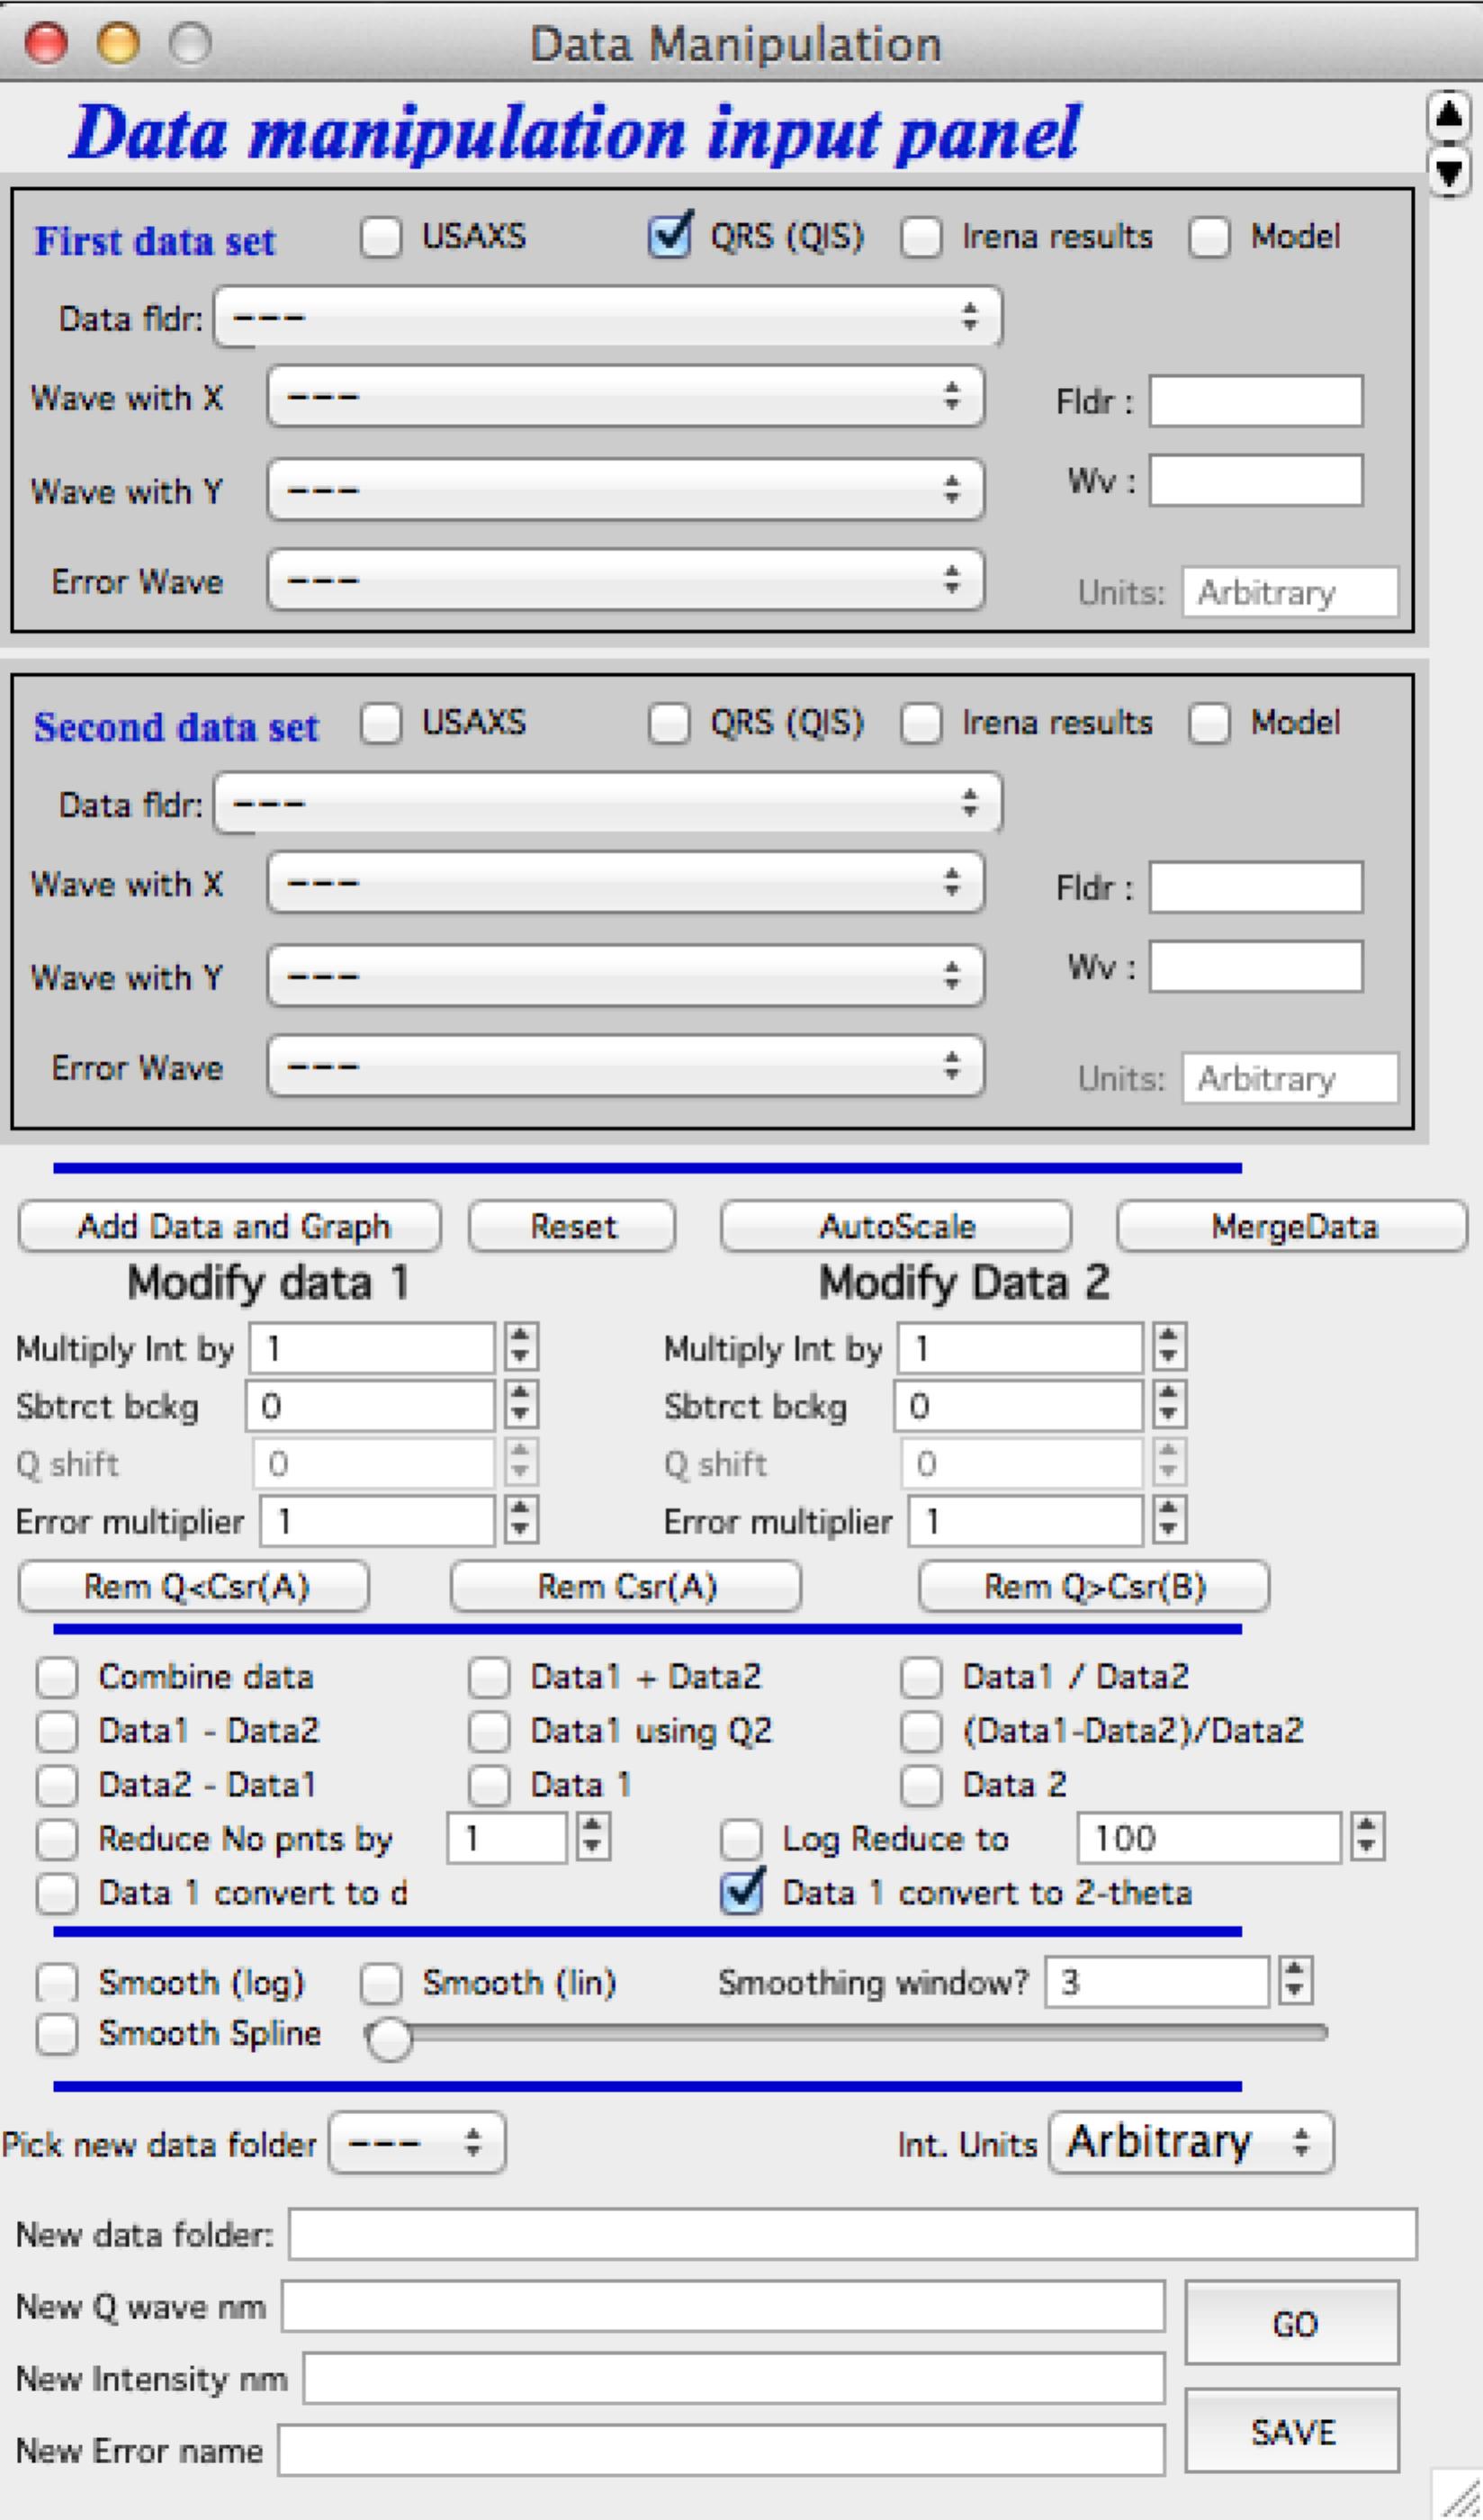 Data manipulation tools — Irena and Nika manuals 1 4